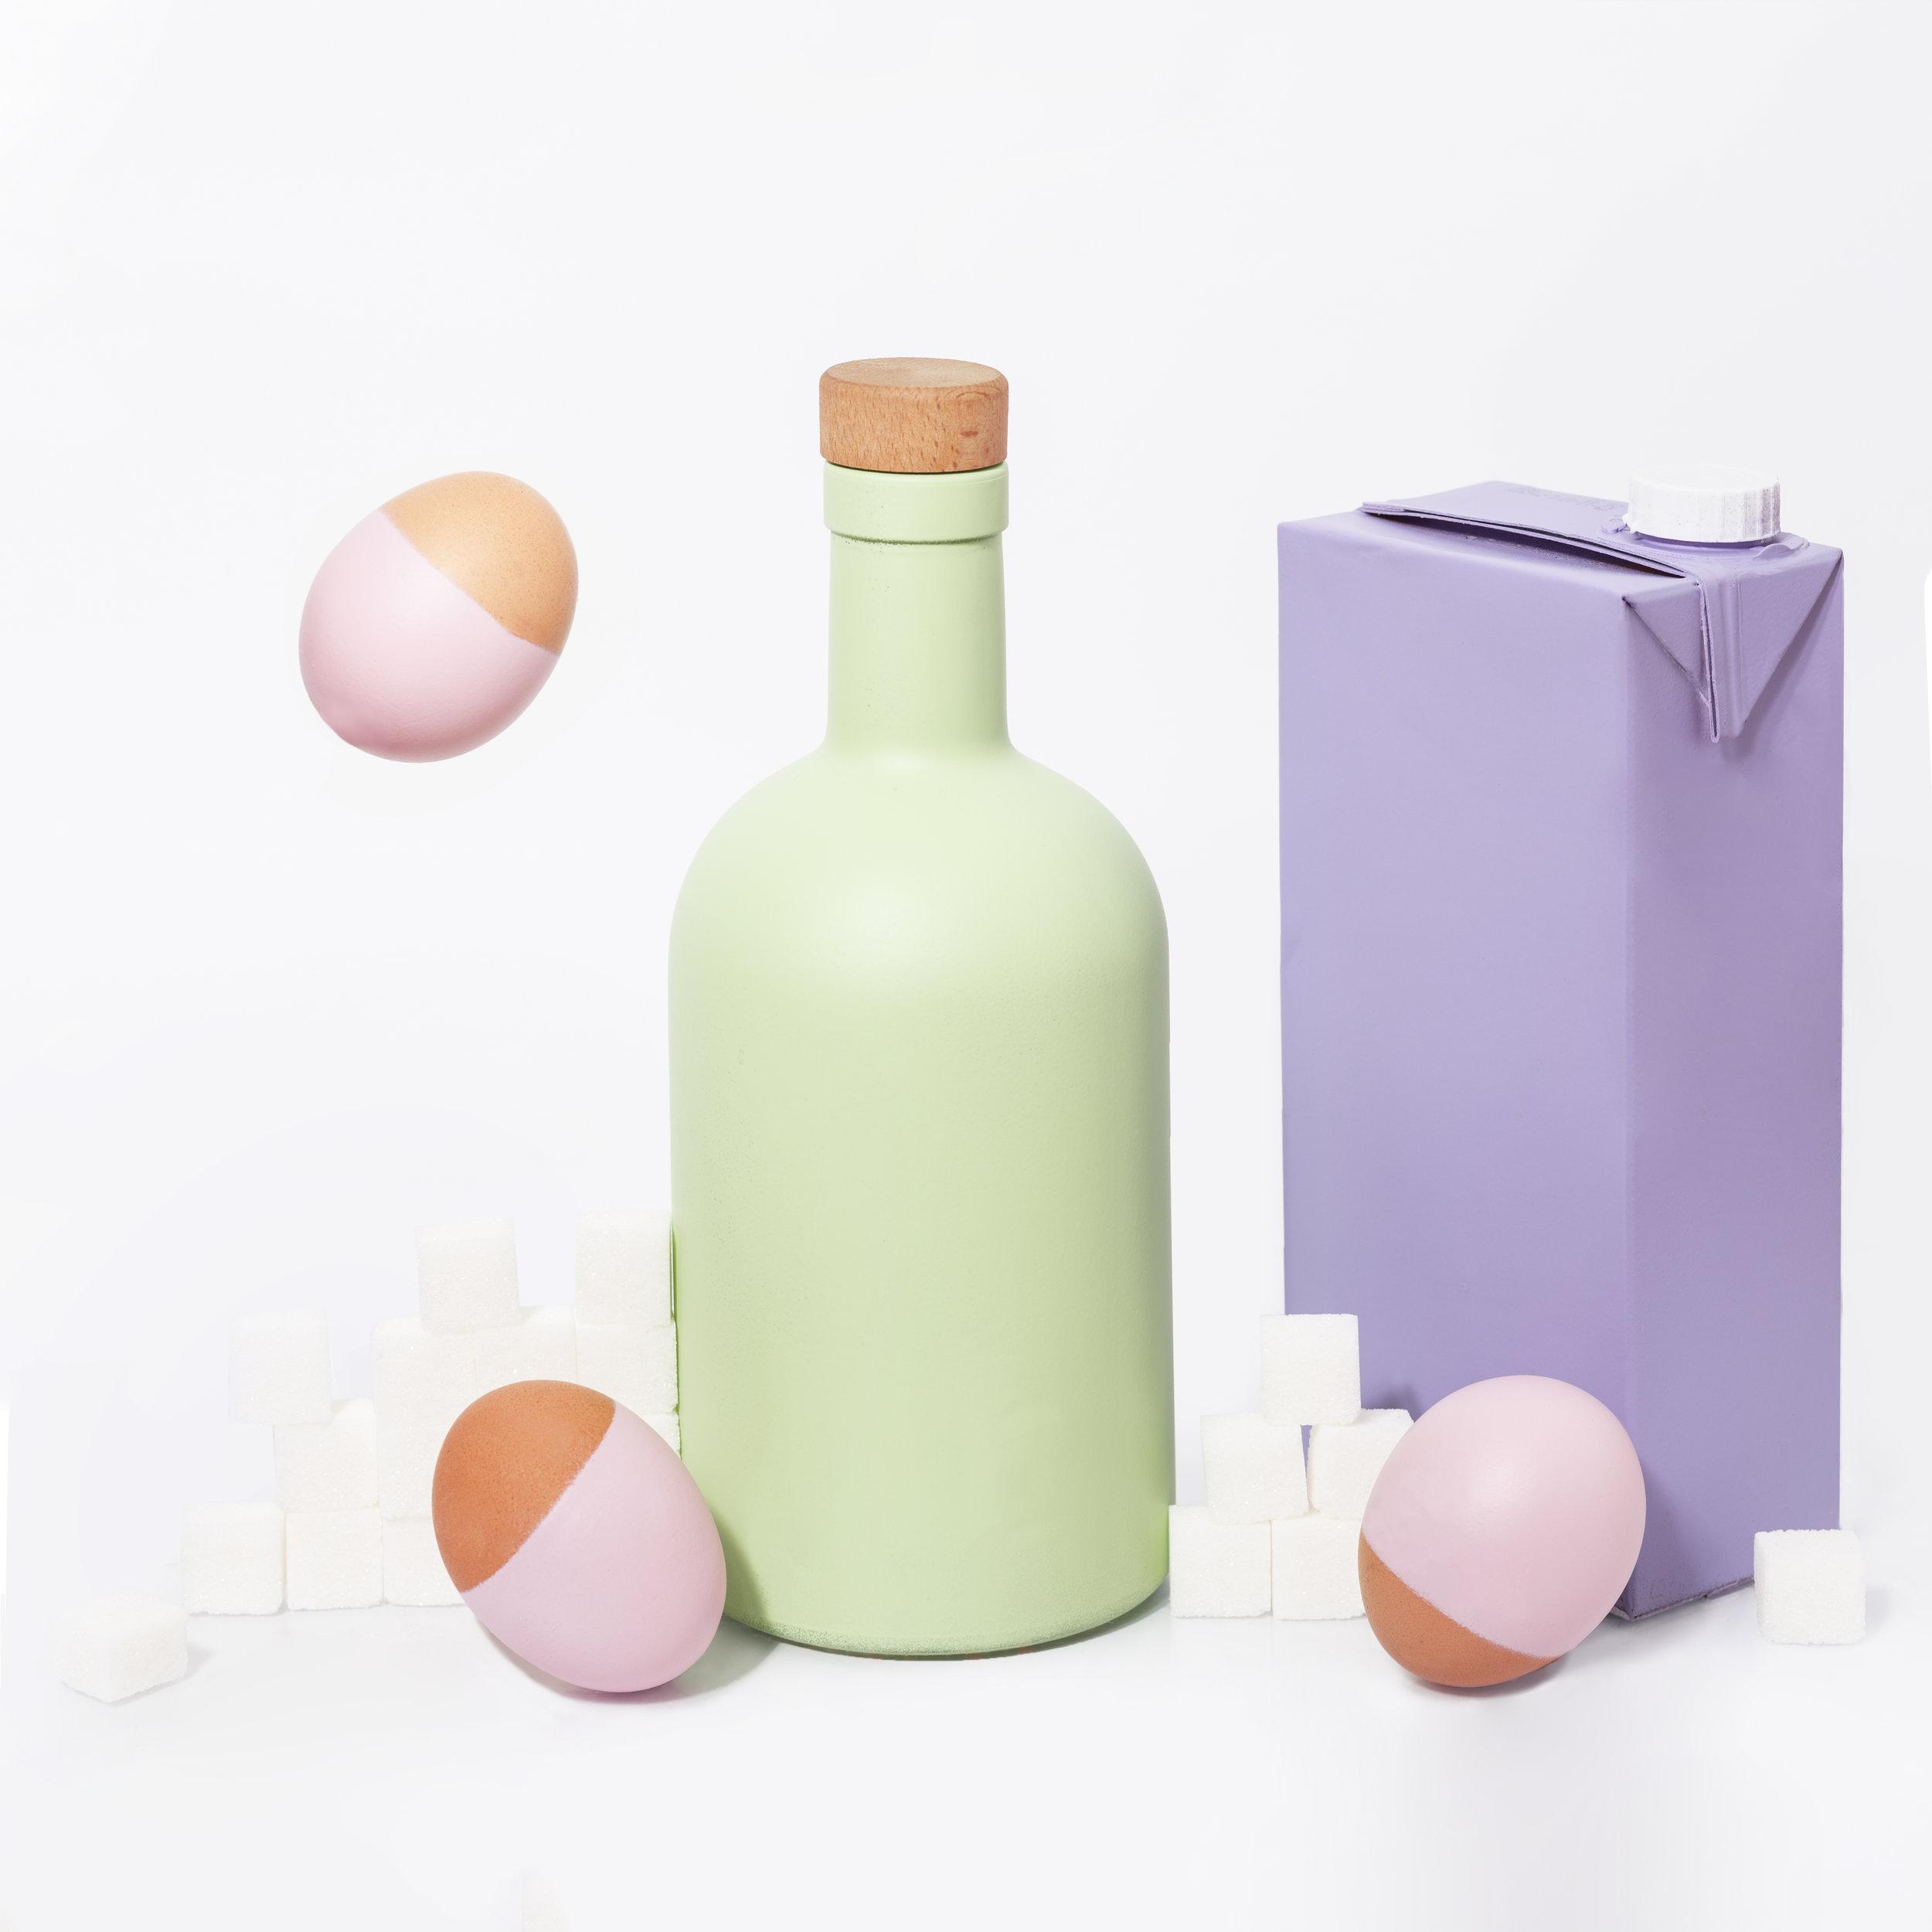 December 24th - Eggnog Day